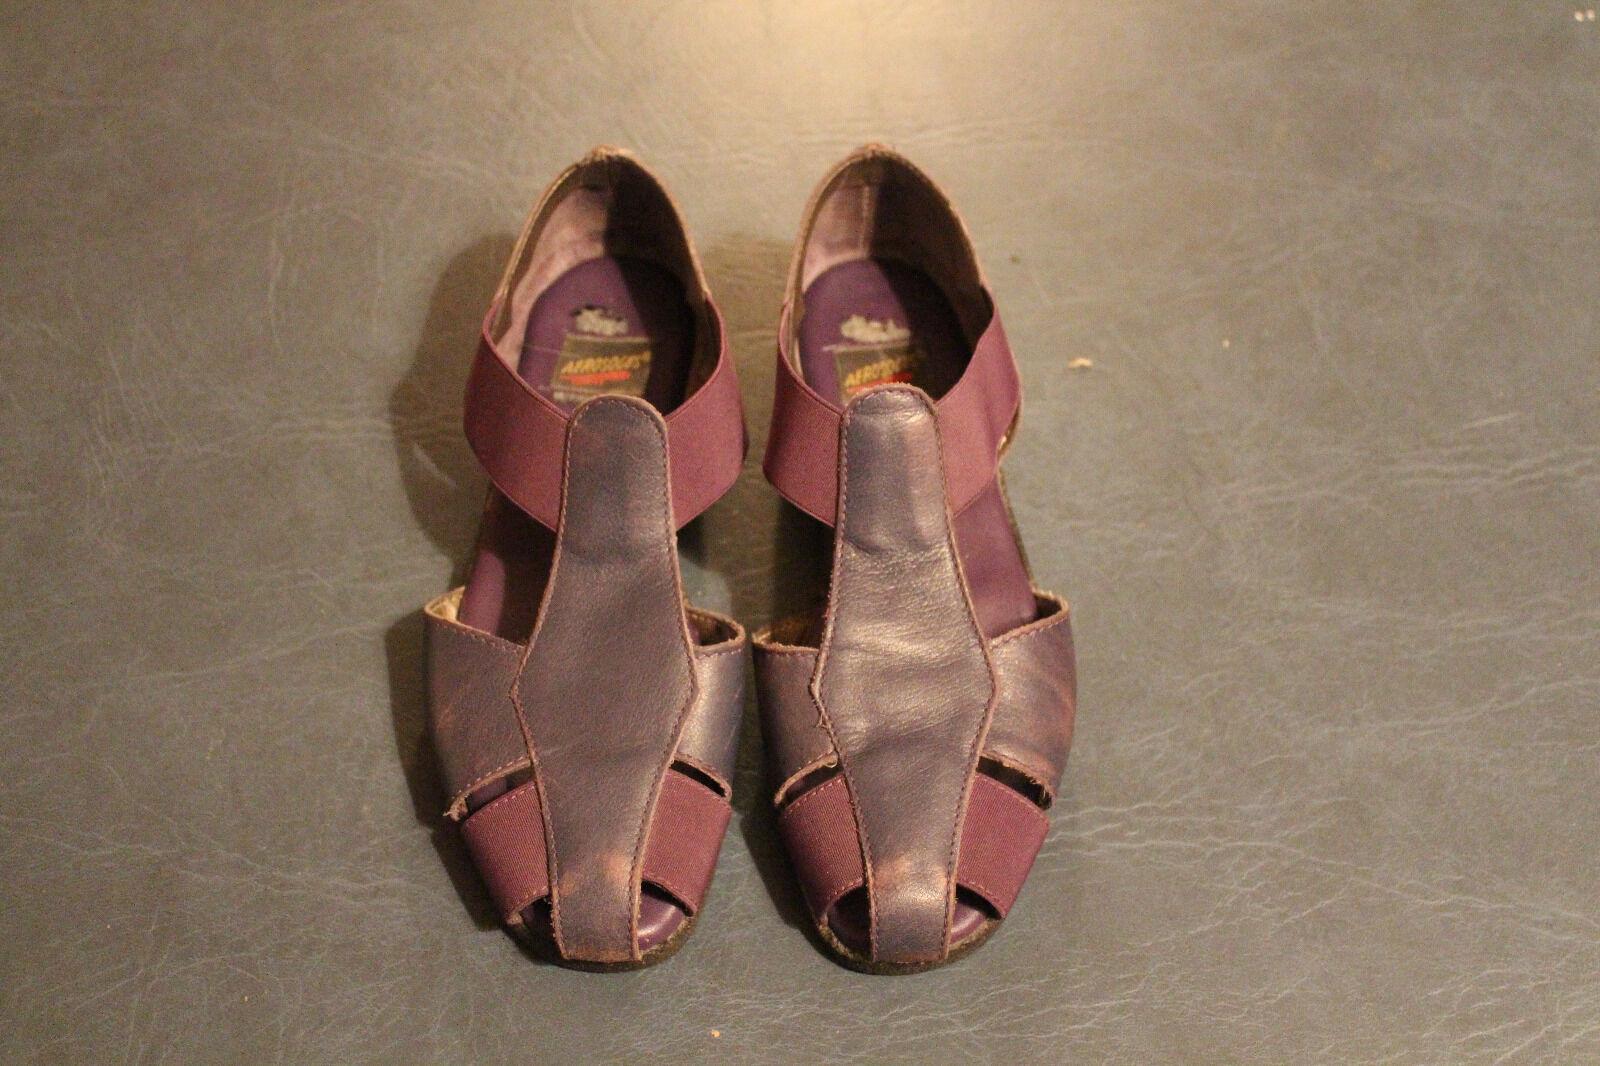 Aerosoles 4 Give Purple Leather Slip On Sandals Womens size 6.5B, 6 1 2BB